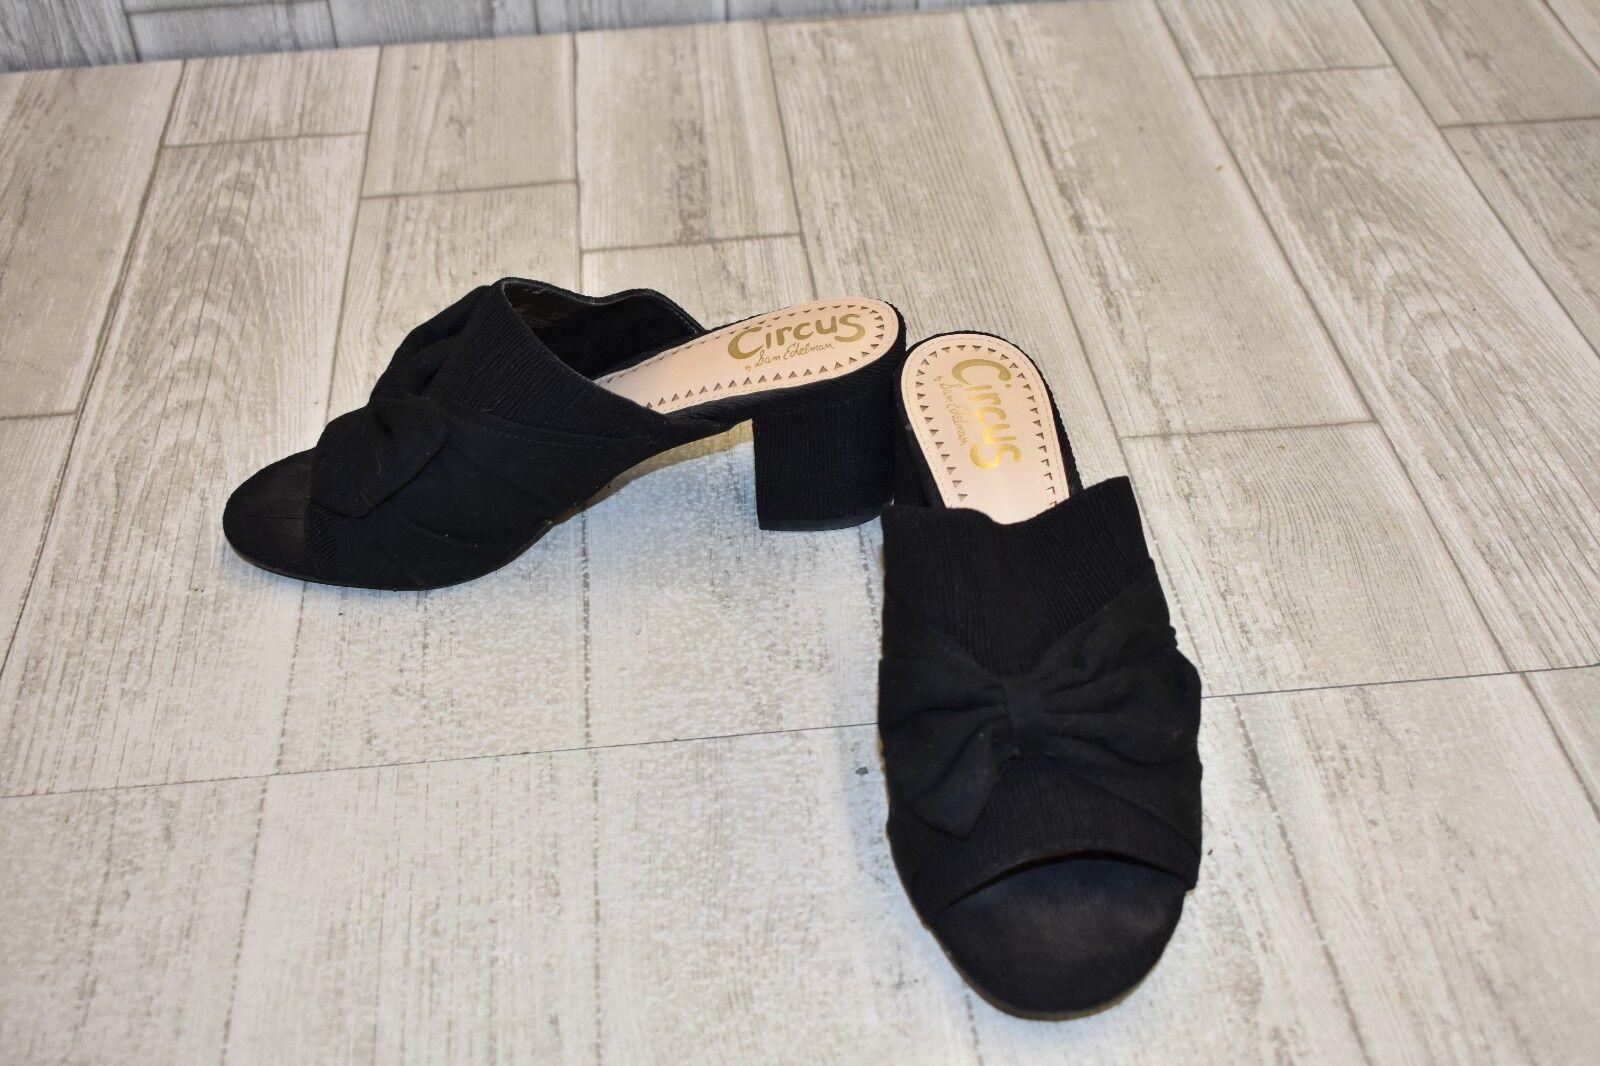 Circus by Sam Edelman Sydney Sandal - Women's Size 9M Black